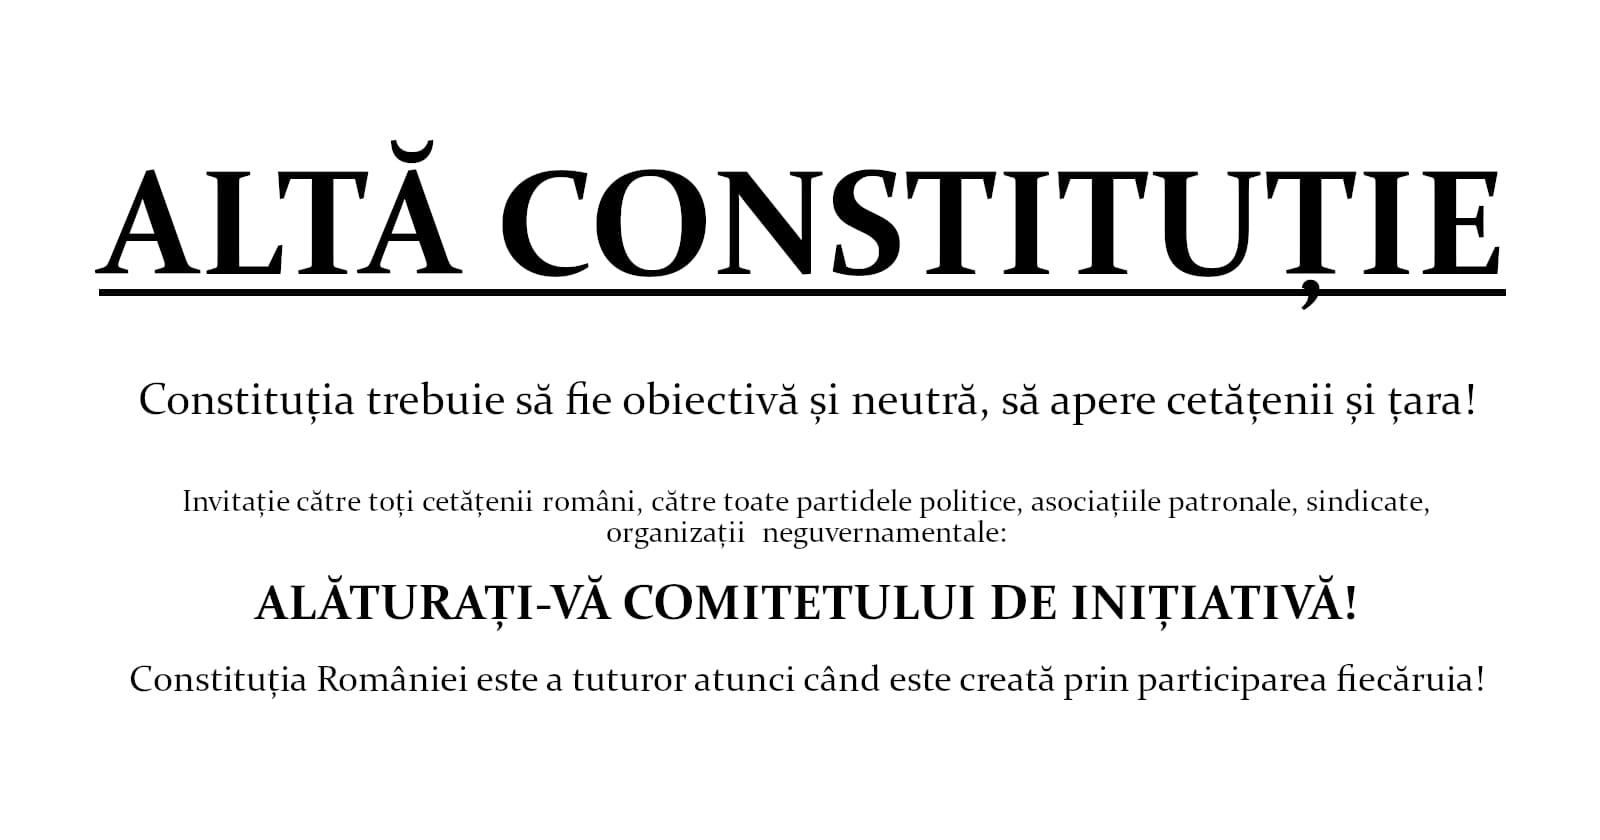 https://ziarul.romania-rationala.ro/control/articole/articole/alta-constitutie-constituire-comitet-de-initiativa.jpg